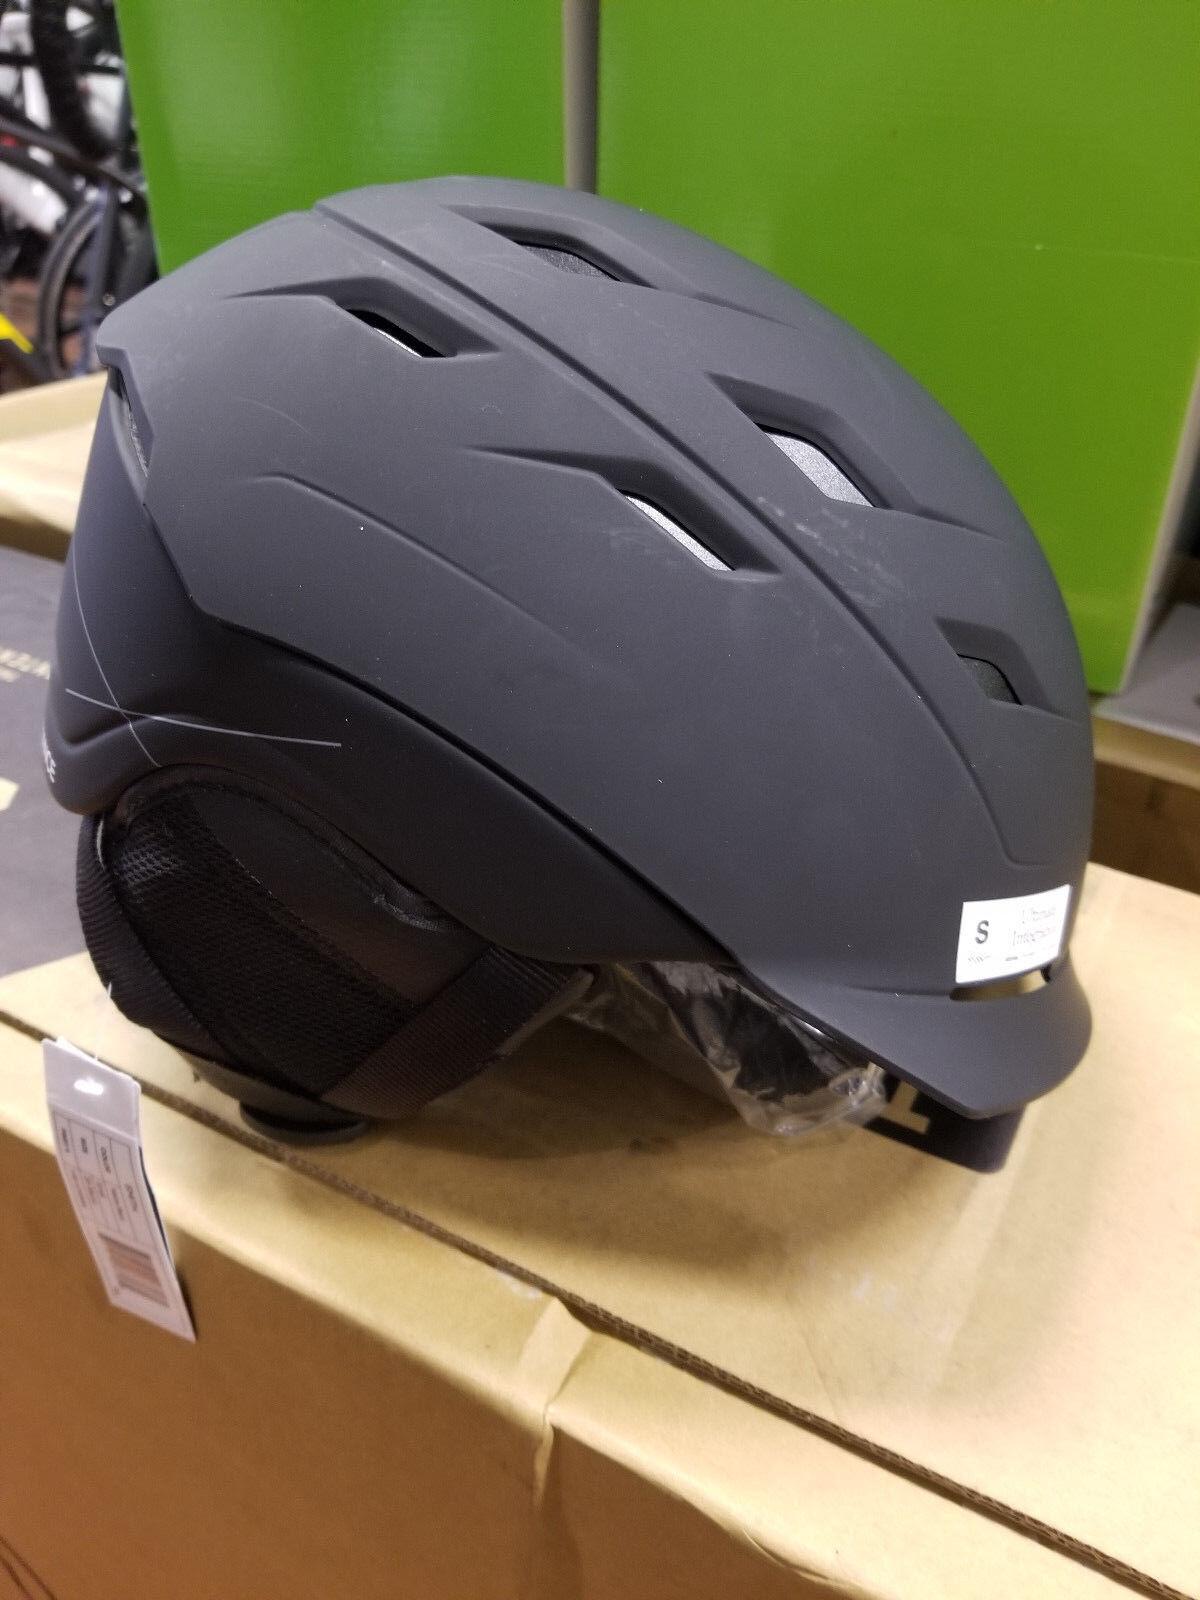 Smith Optics Unisex Adult Variance Snow Sports Helmet - Small 51-55cm Matte Blk